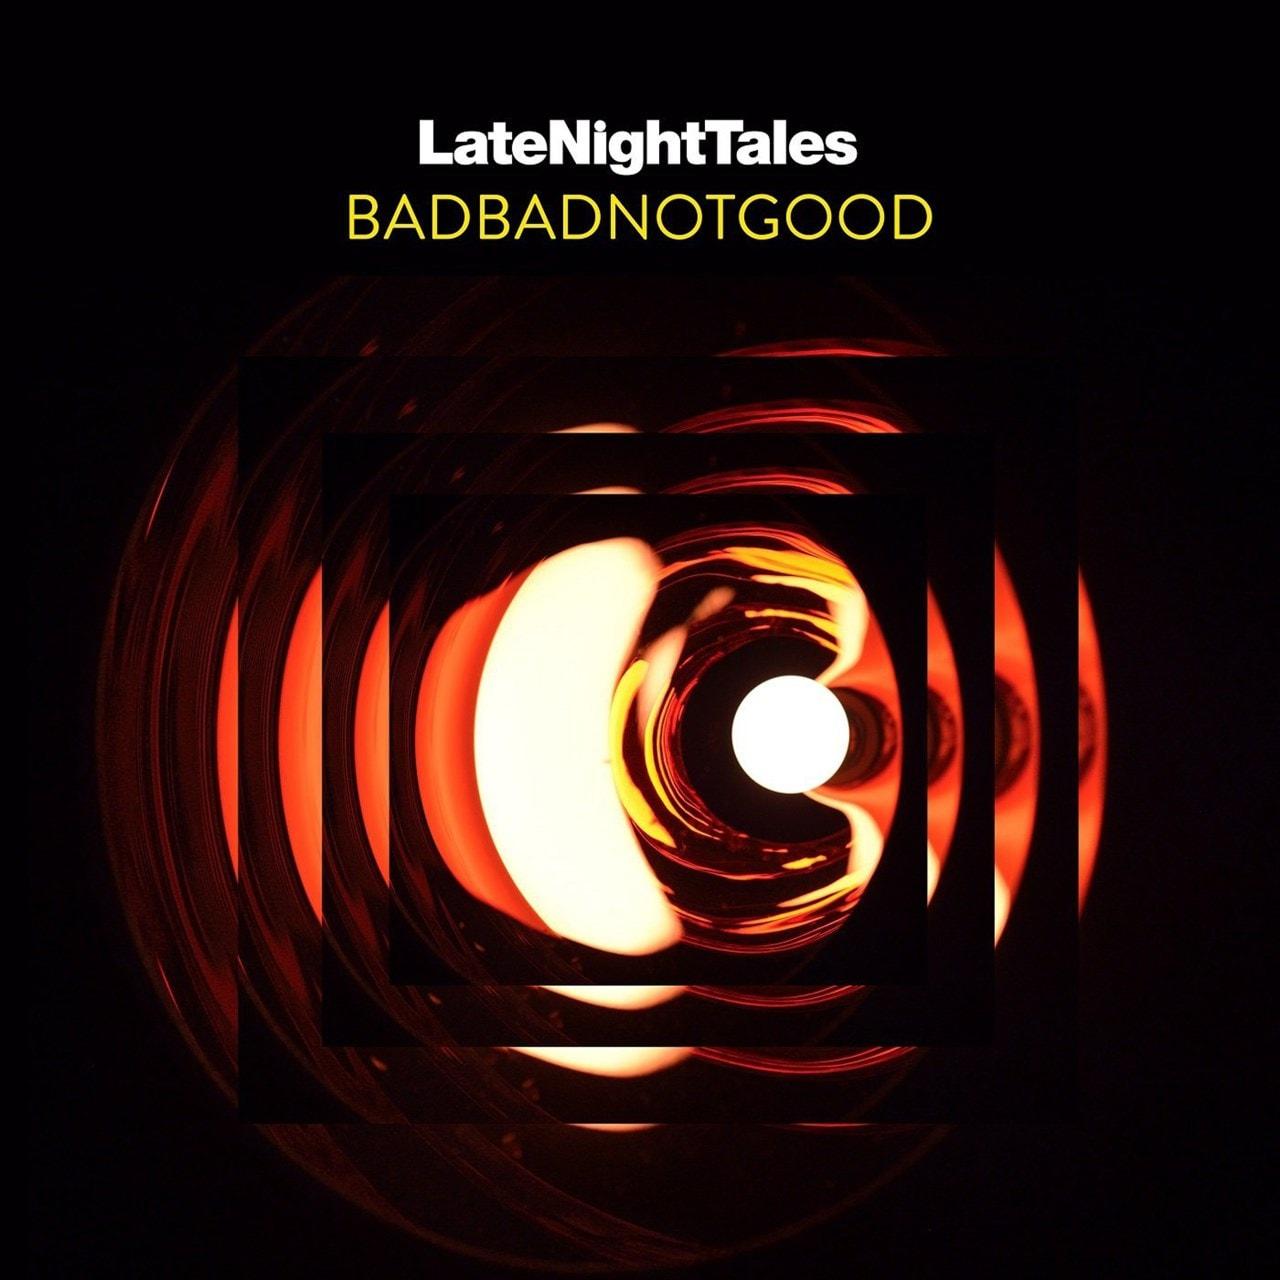 Late Night Tales: Badbadnotgood - 1